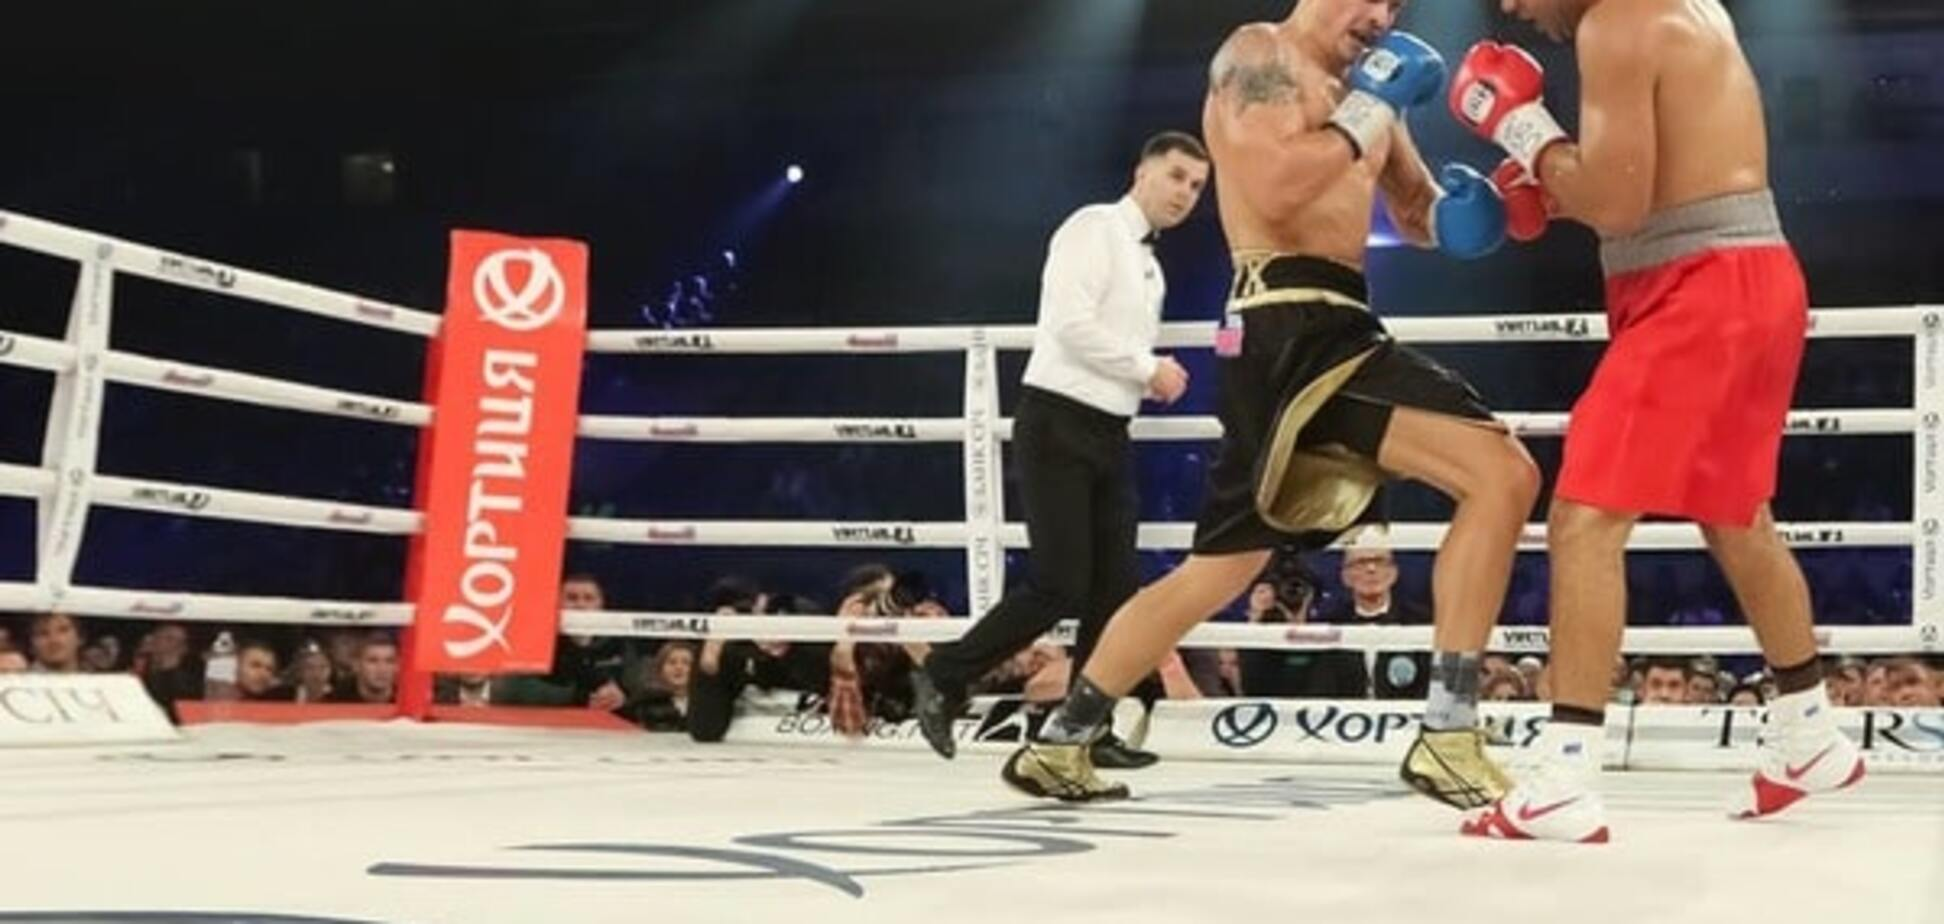 Нагорода за нокаут: Усик піднявся в рейтингу WBC